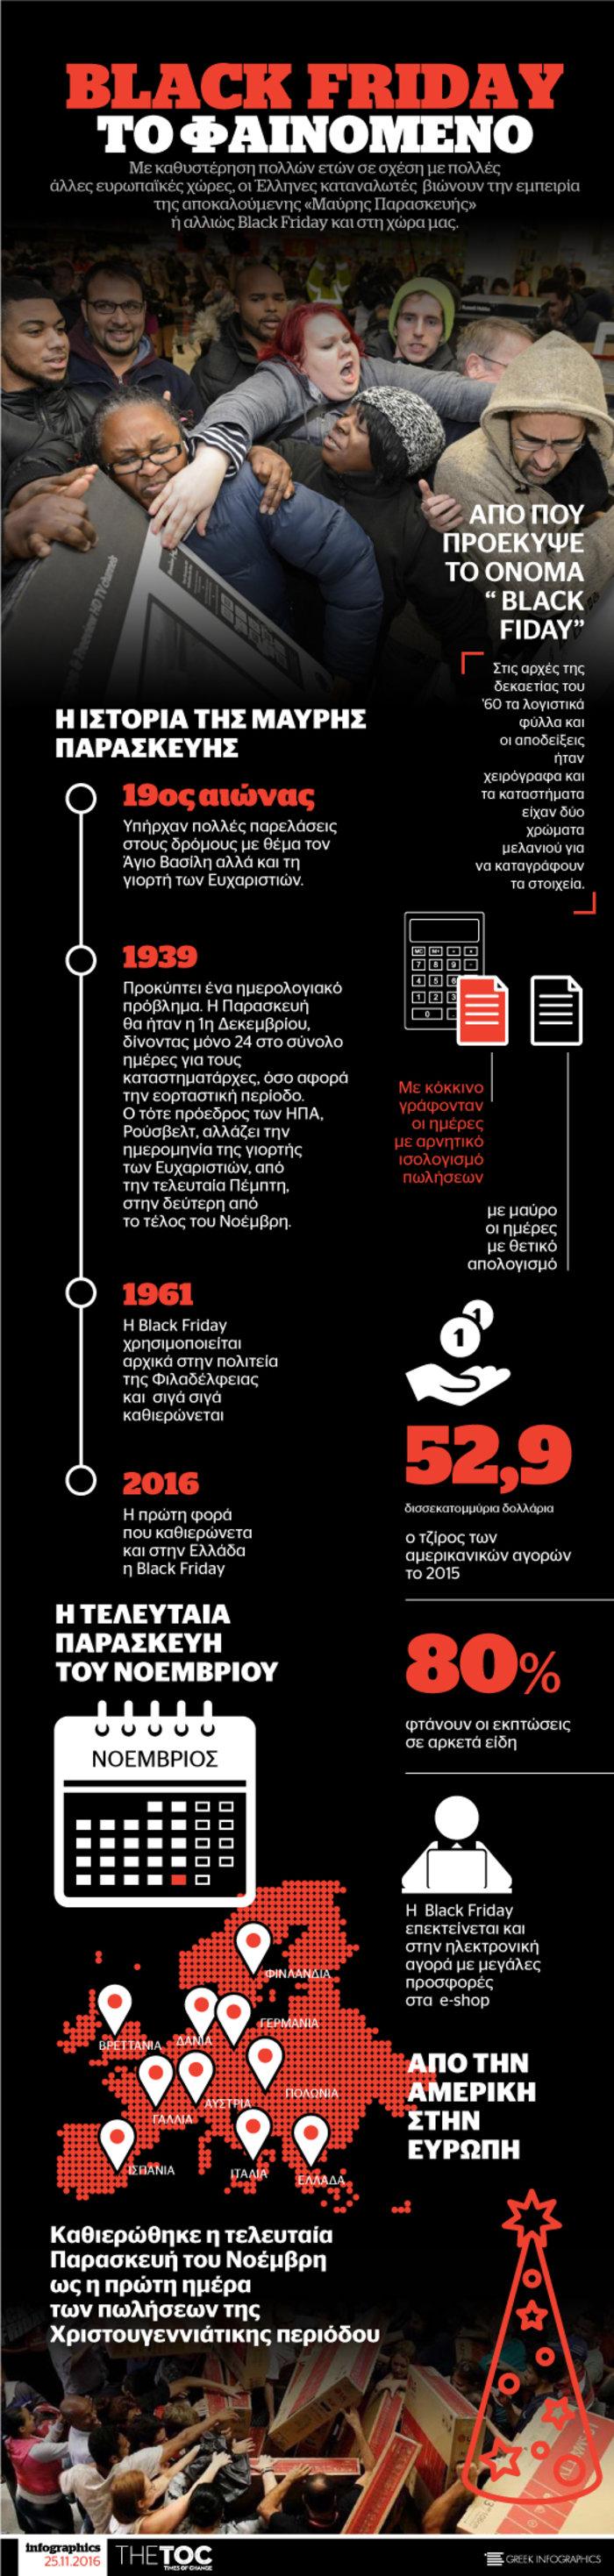 H ιστορία της Black Friday μέσα από ένα infographic